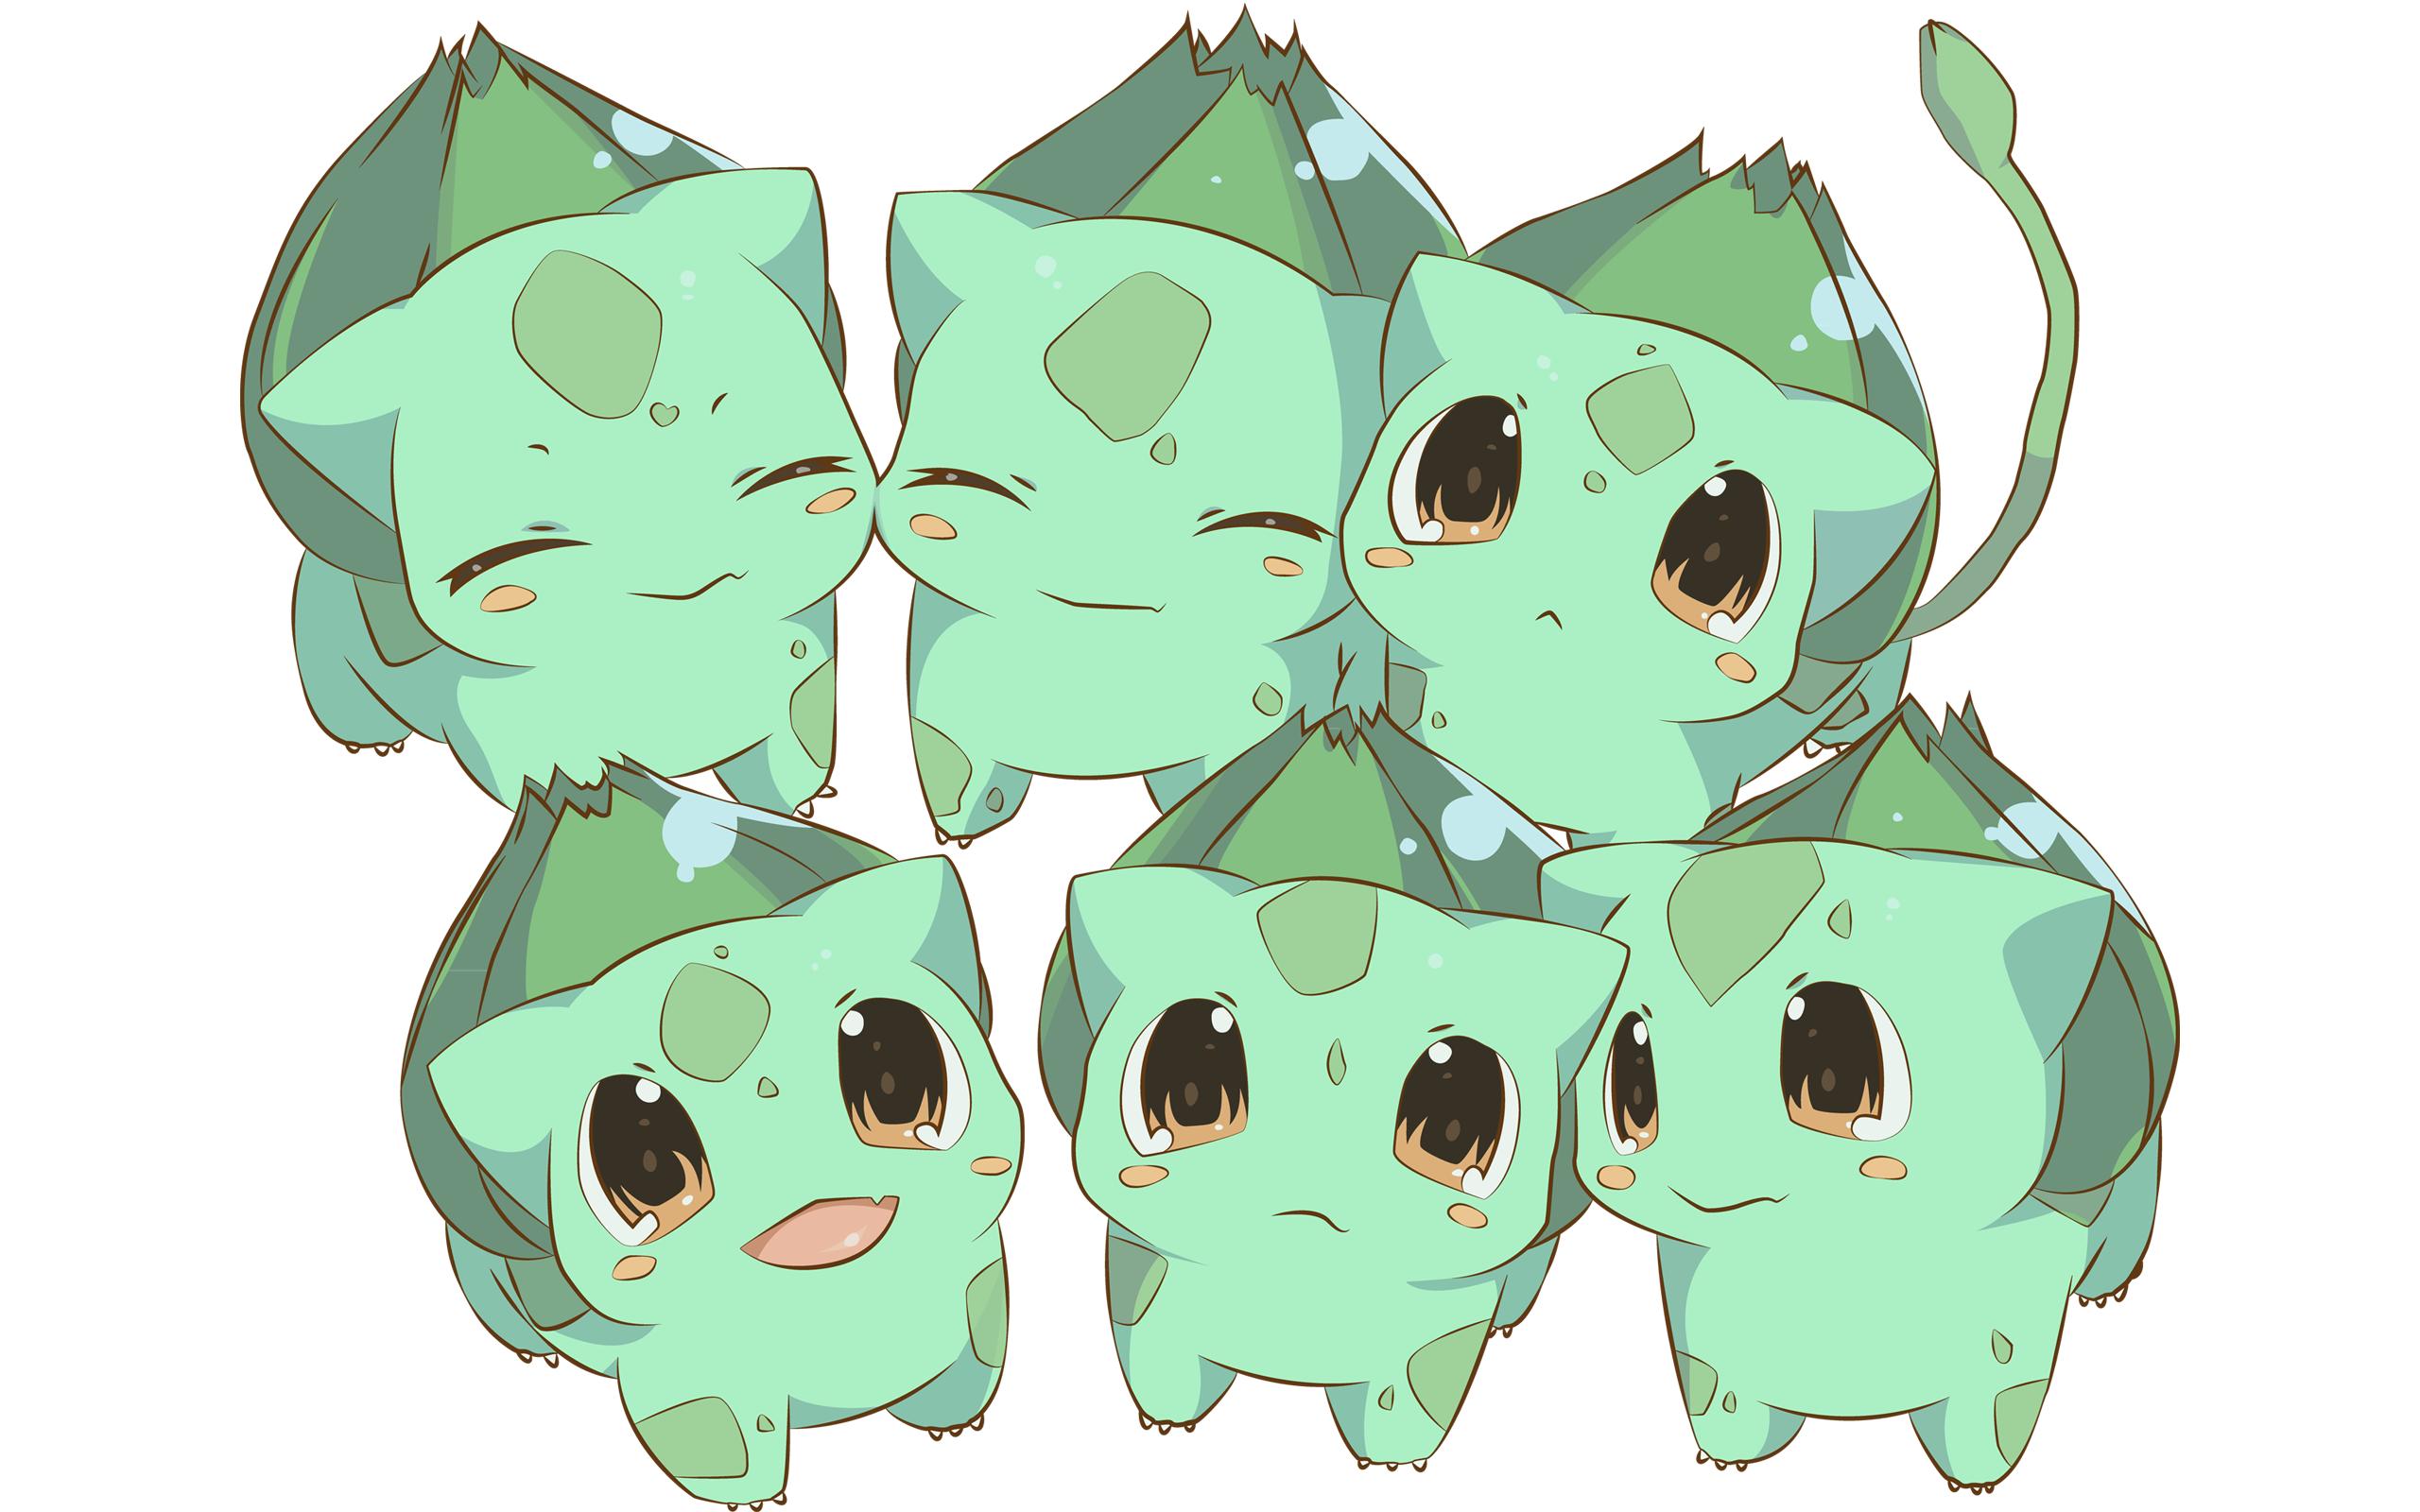 Chibi Wallpaper 2560x1600 Bulbasaur Chibi Kawaii Cute Chibi 2560x1600